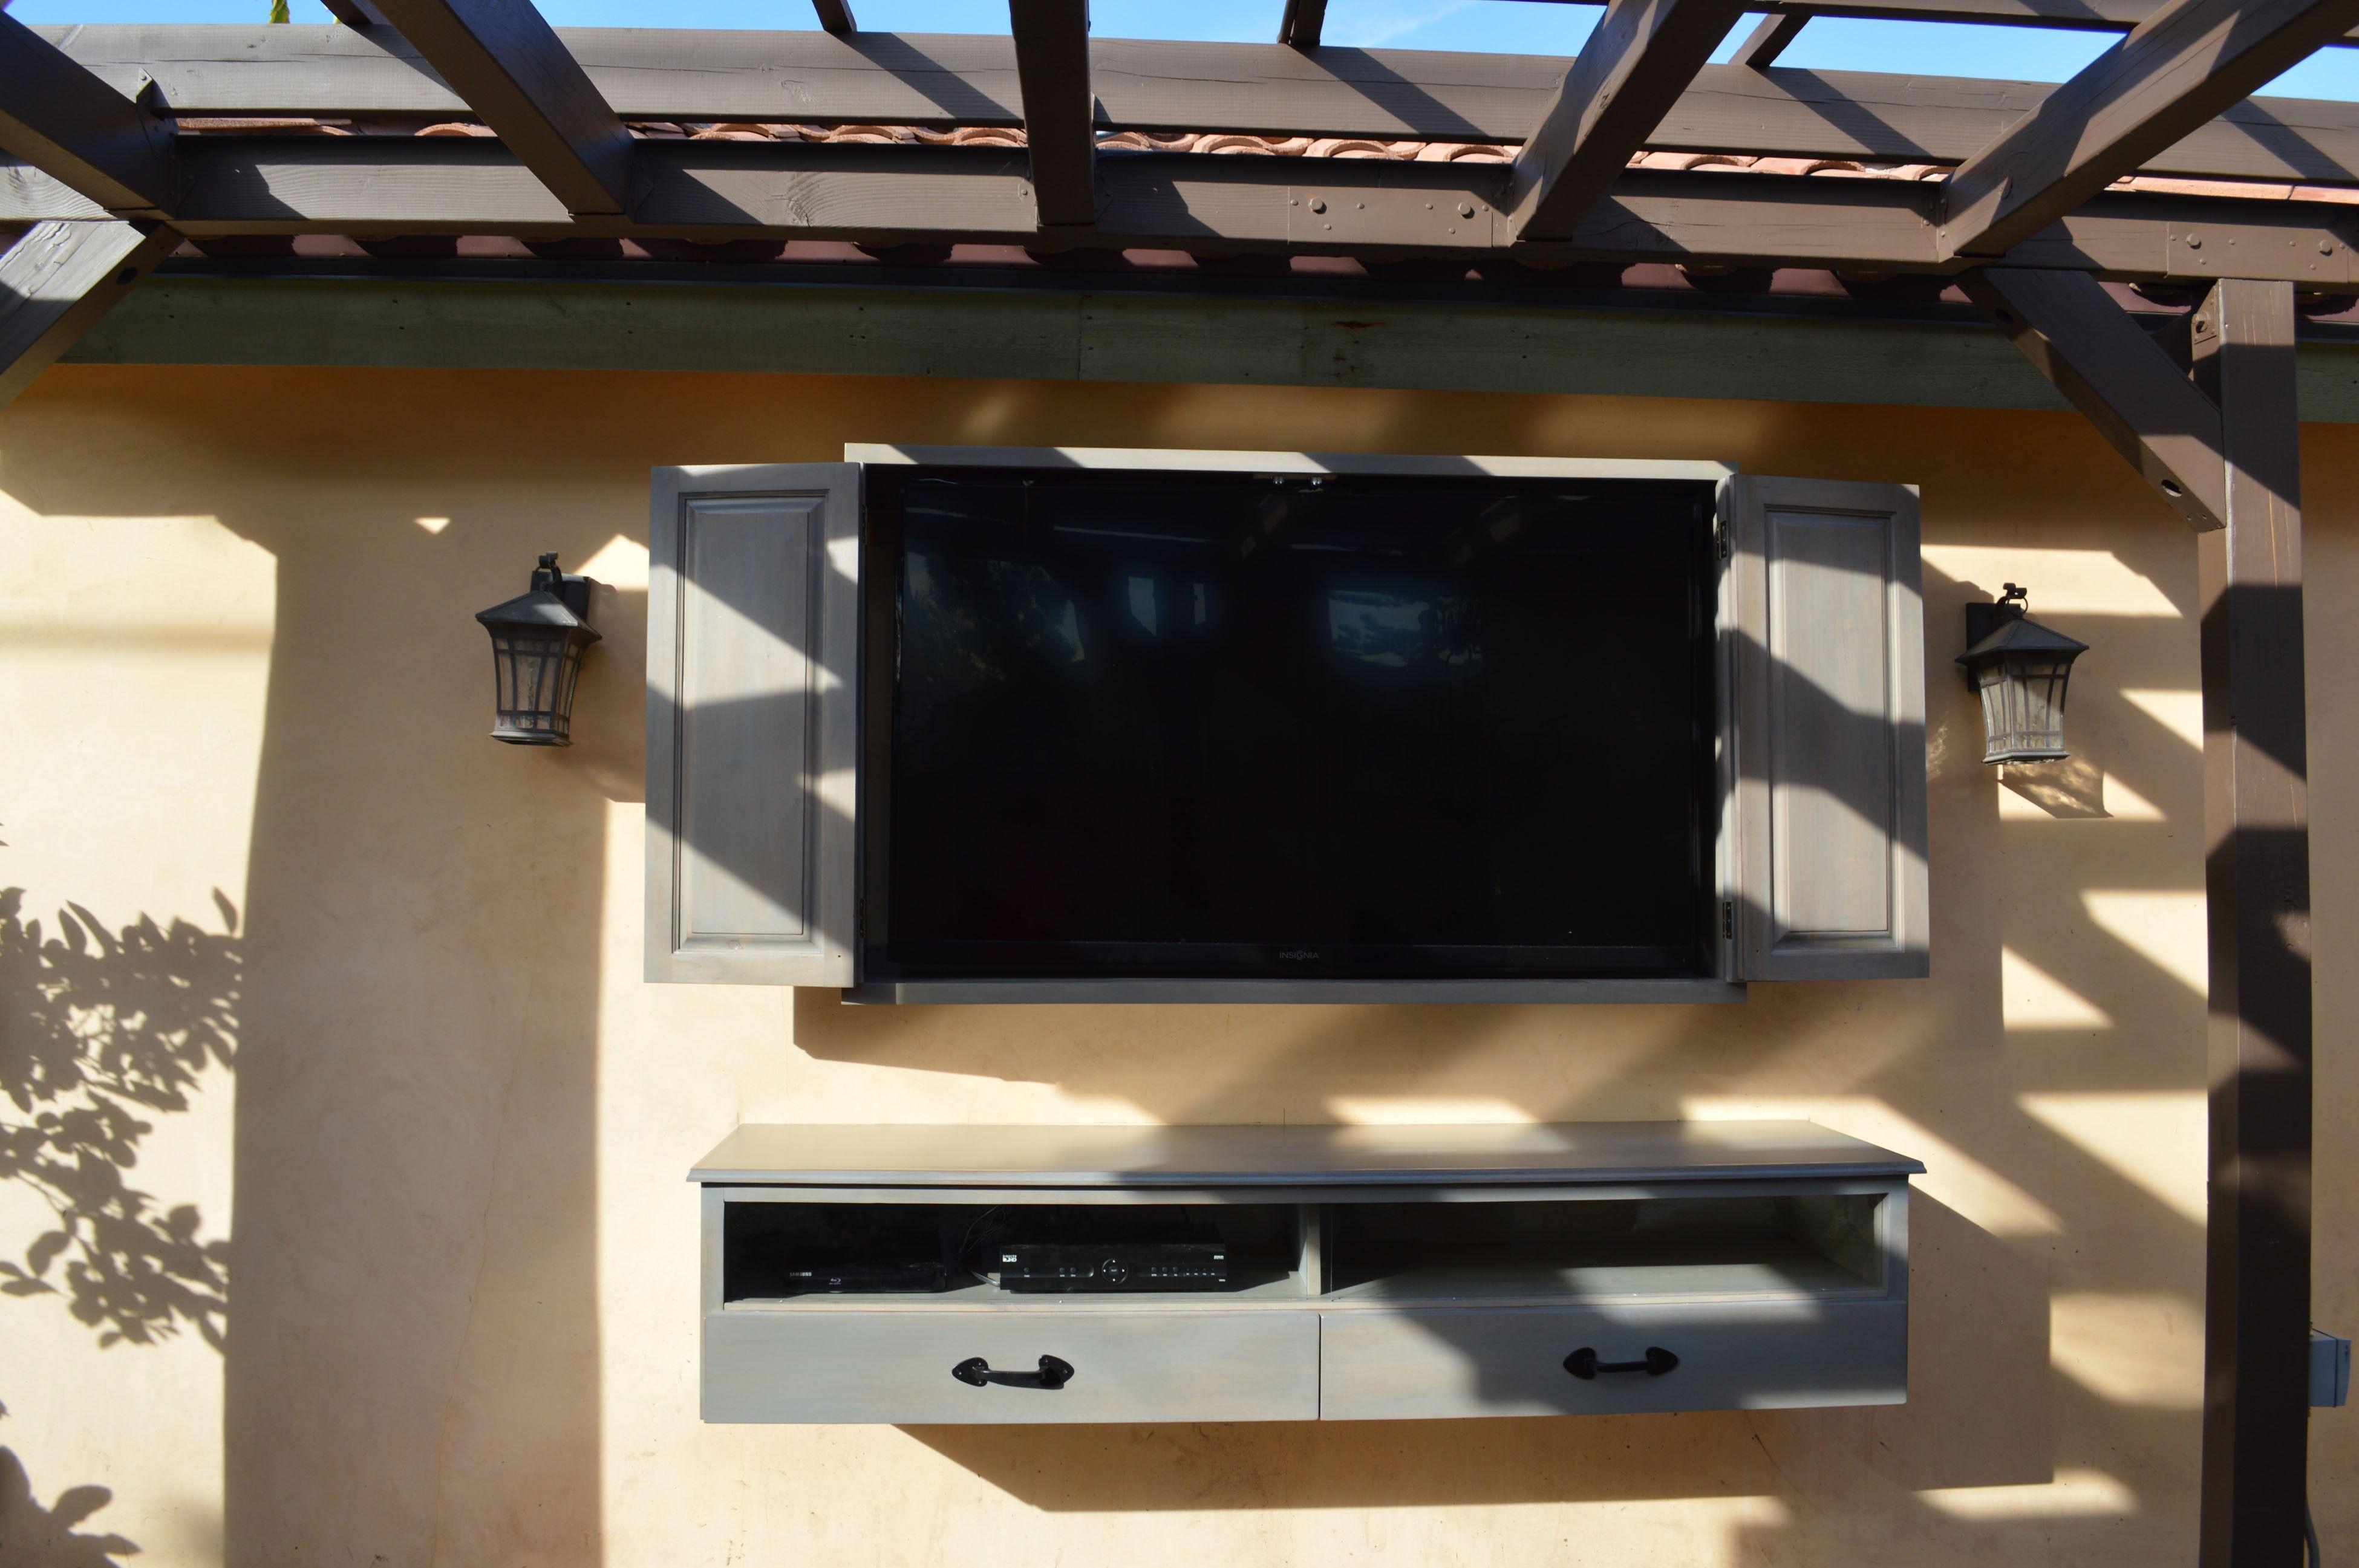 Building Waterproof Outdoor Tv Cabinet Outdoor Tv Cabinet Waterproof Outdoor Tv Cabinet Outdoor Storage Cabinet Outdoor Tv Enclosure